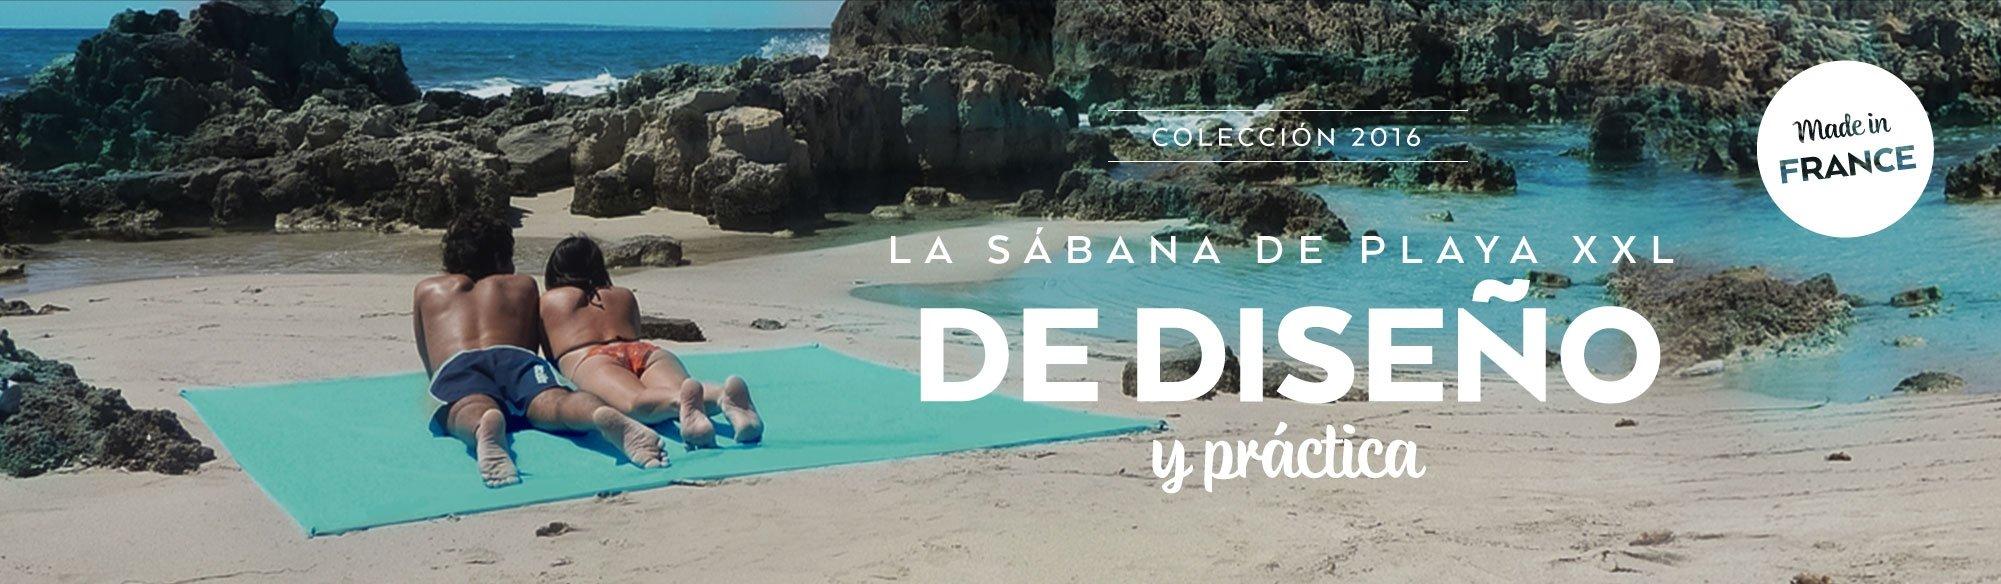 La sabana de playa de diseno